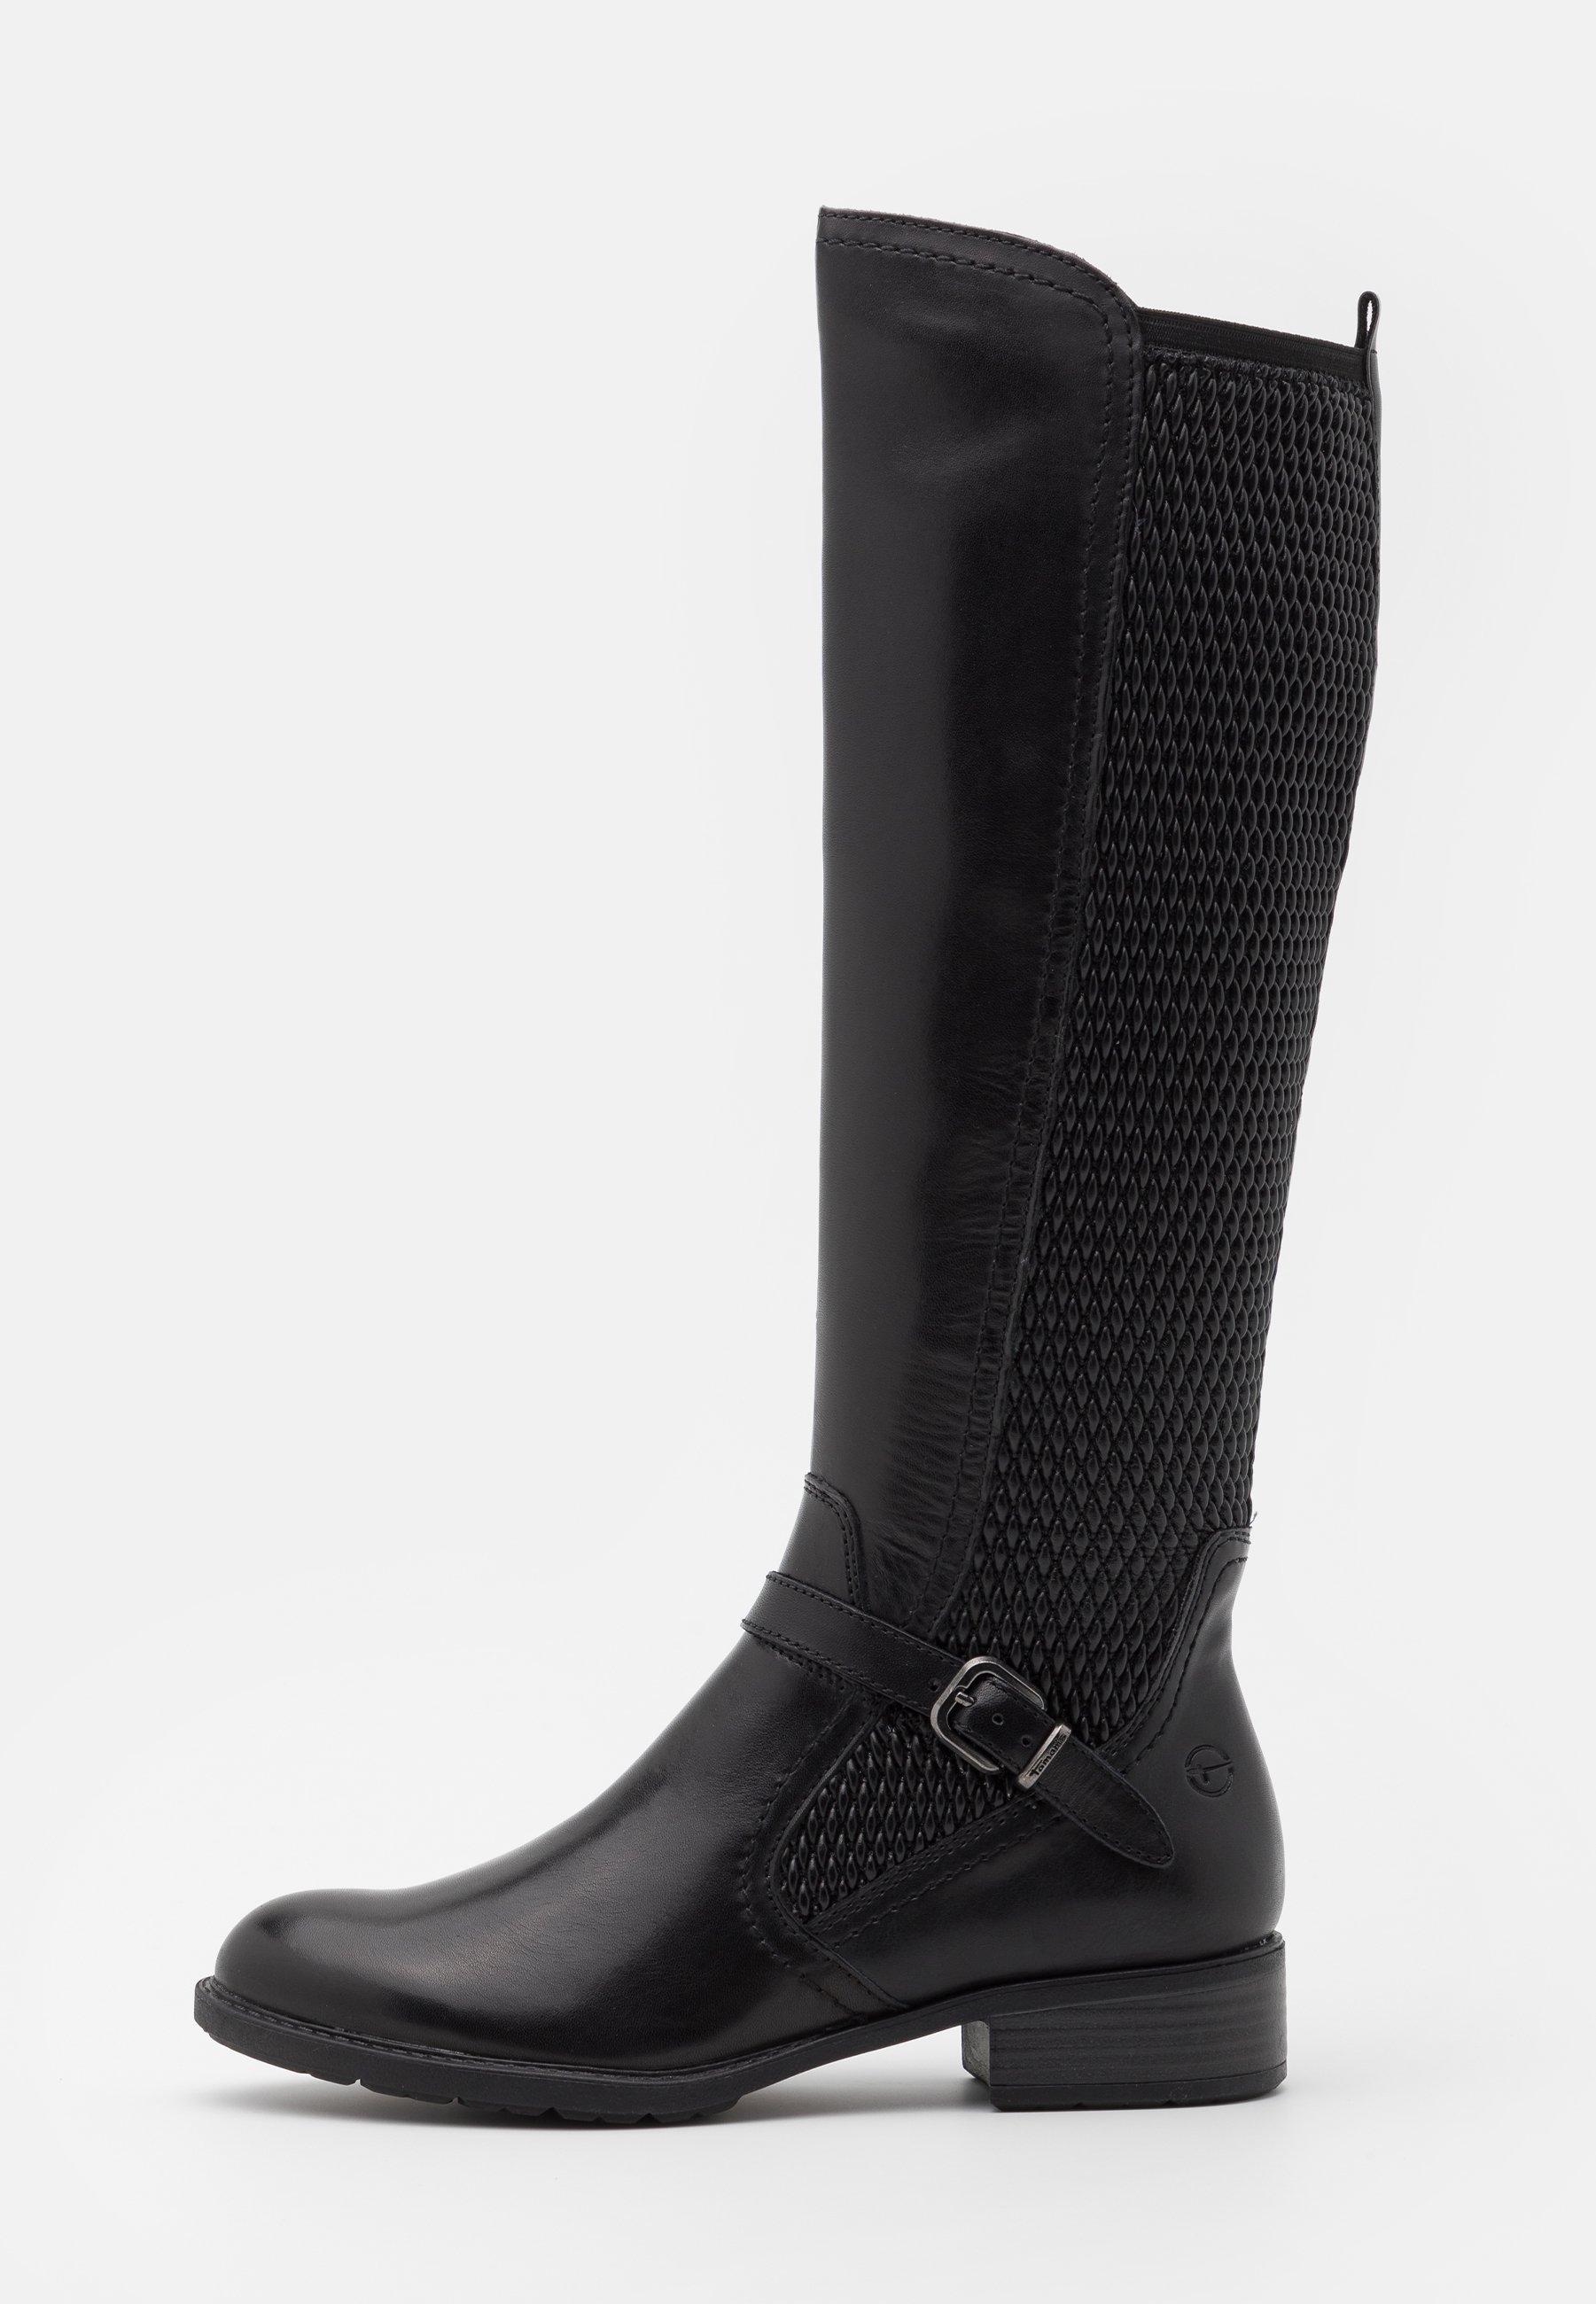 schwarze stiefel business tamaris